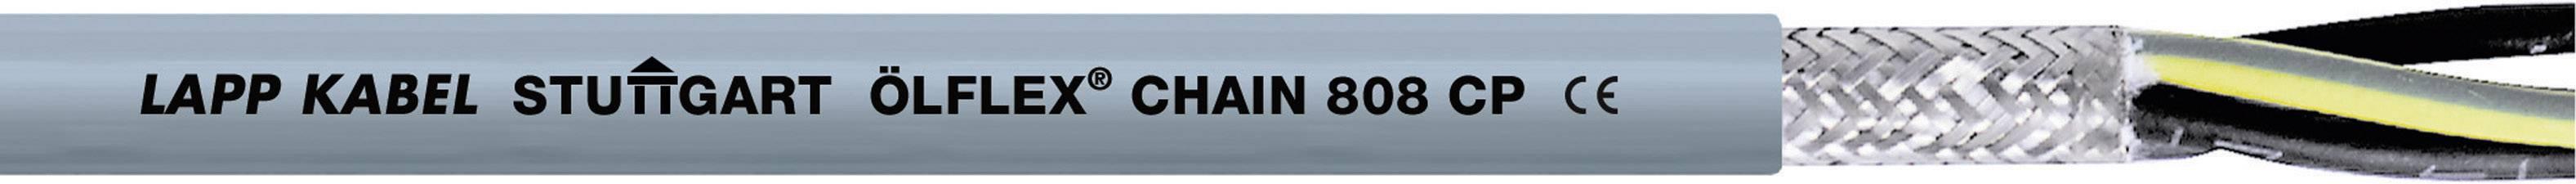 Žíla kabelu LappKabel ÖLFLEX CHAIN 808 CP 2X1,0 (1027767), 2x 1 mm², polyurethan, Ø 6,5 mm, stíněný, 1 m, šedá